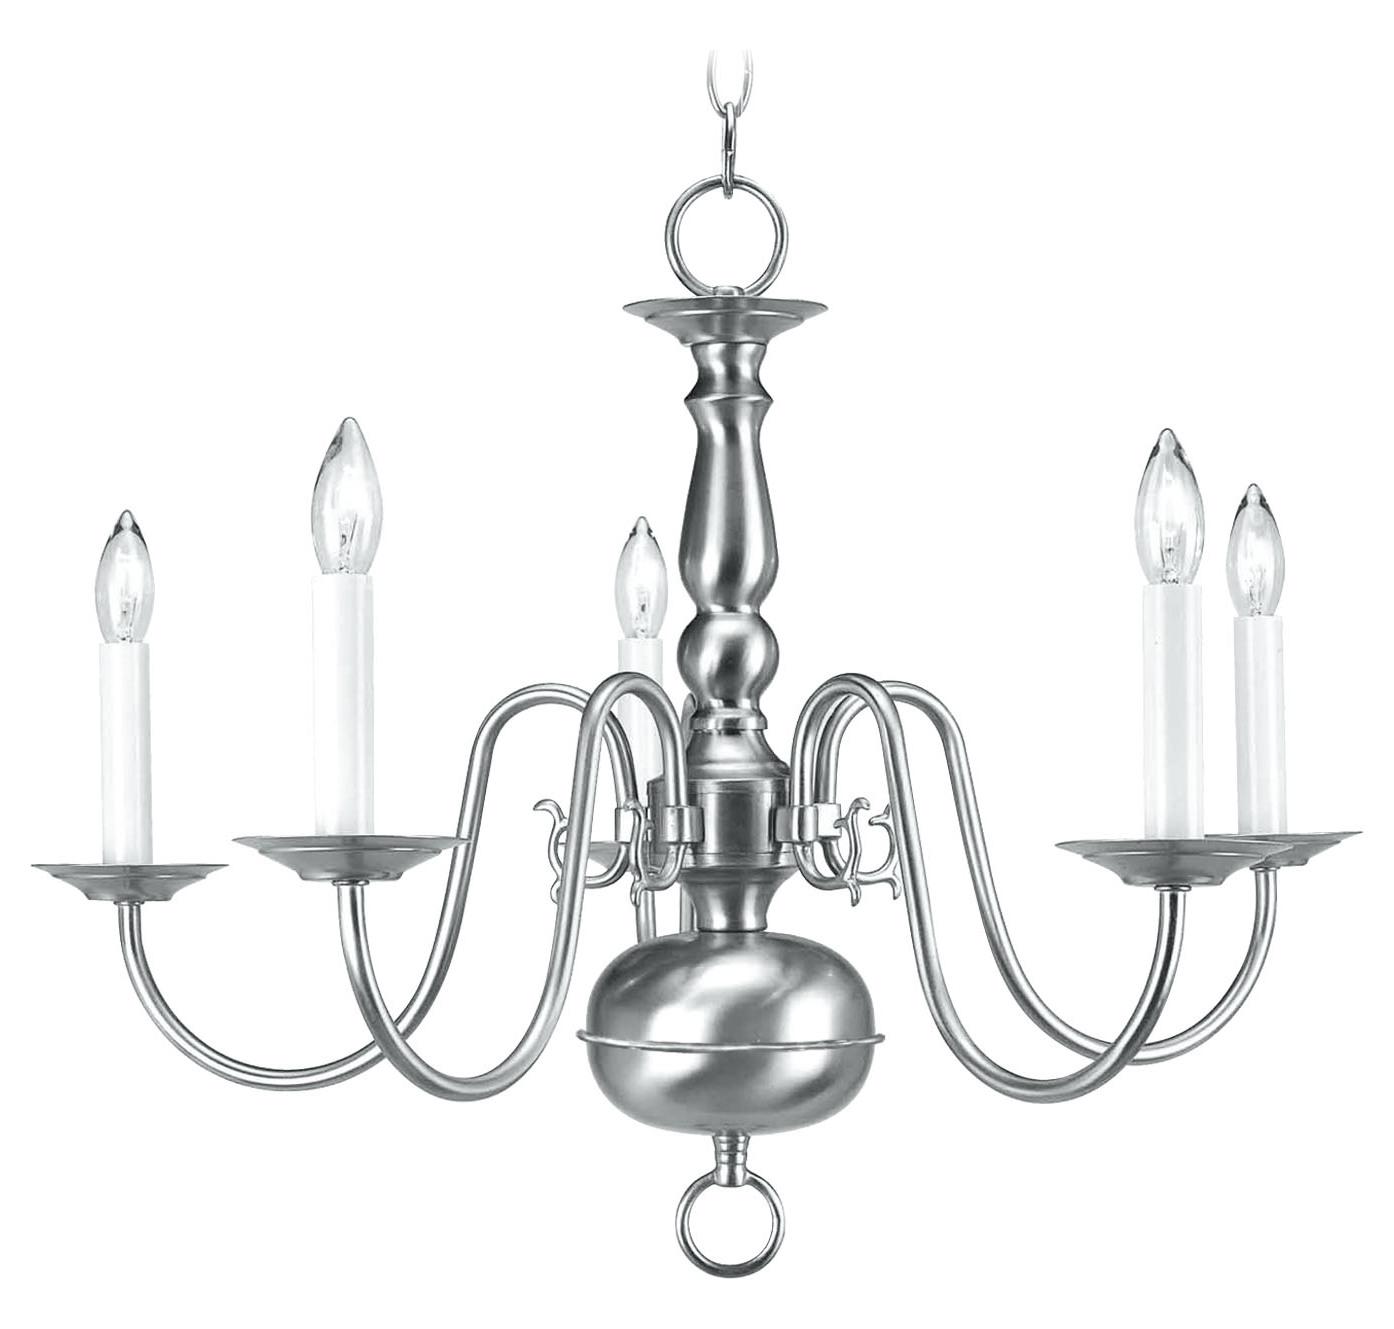 Livex Lighting Brushed Nickel 5 Light 300w Chandelier With